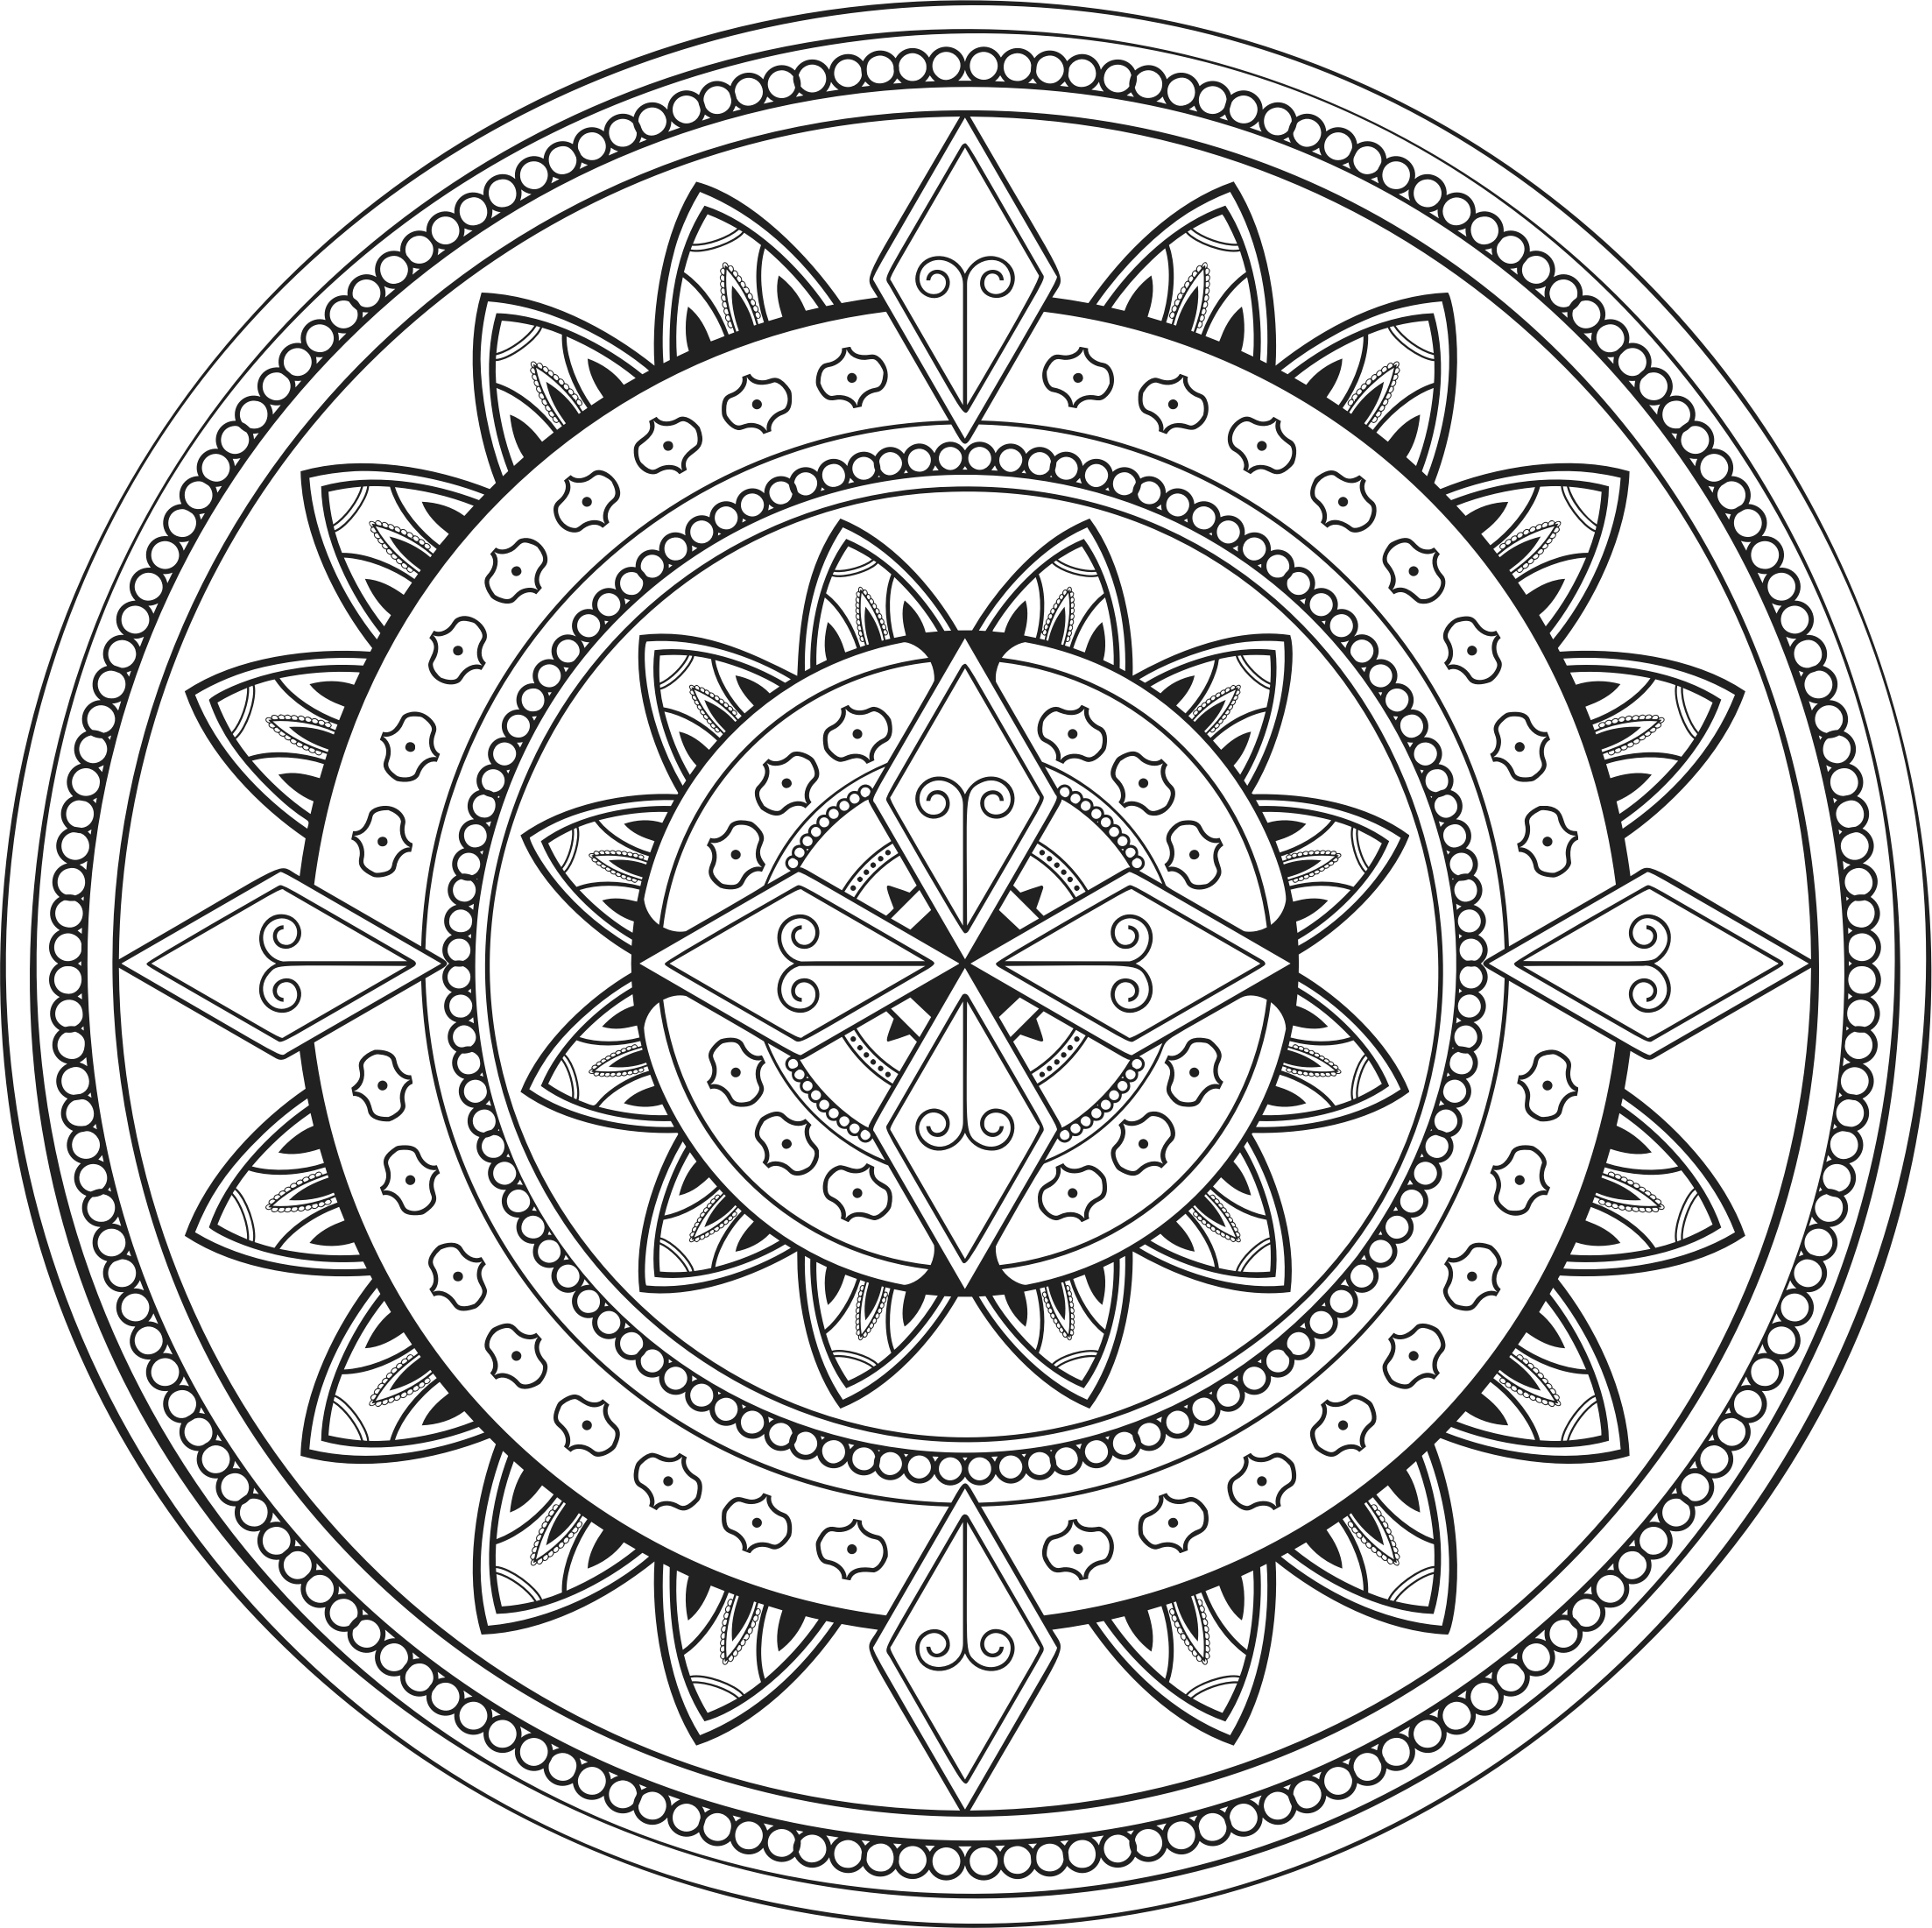 vector stock Mandala transparent background. Ornamental png .